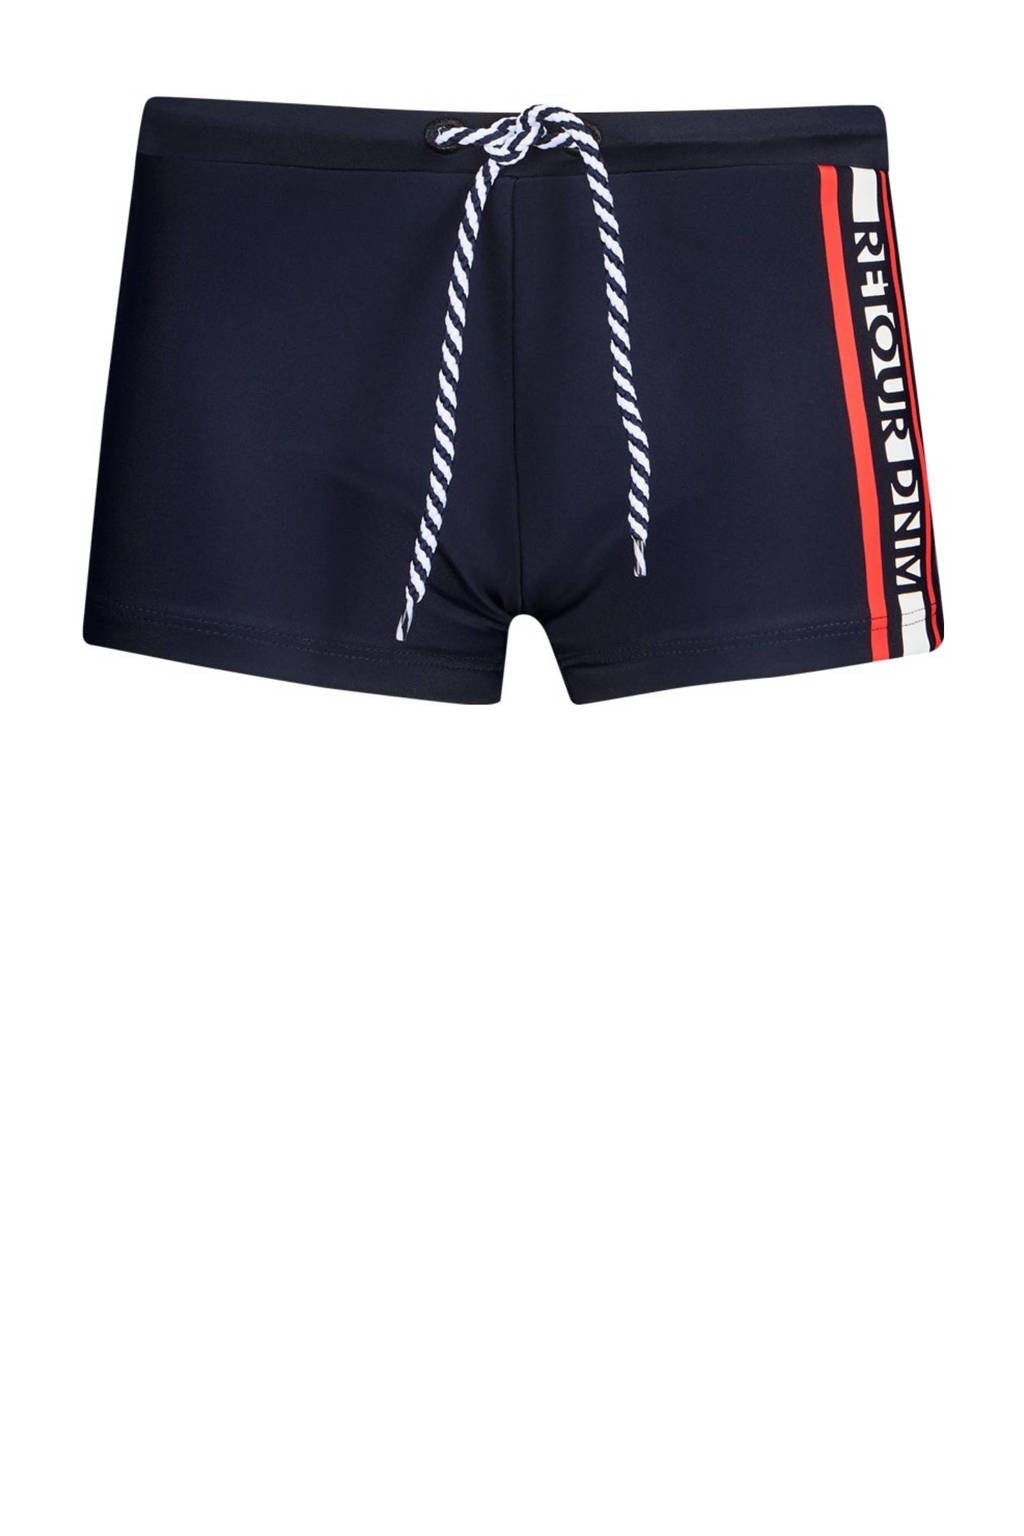 Retour Denim zwemboxer Alano donkerblauw/rood, Donkerblauw/rood